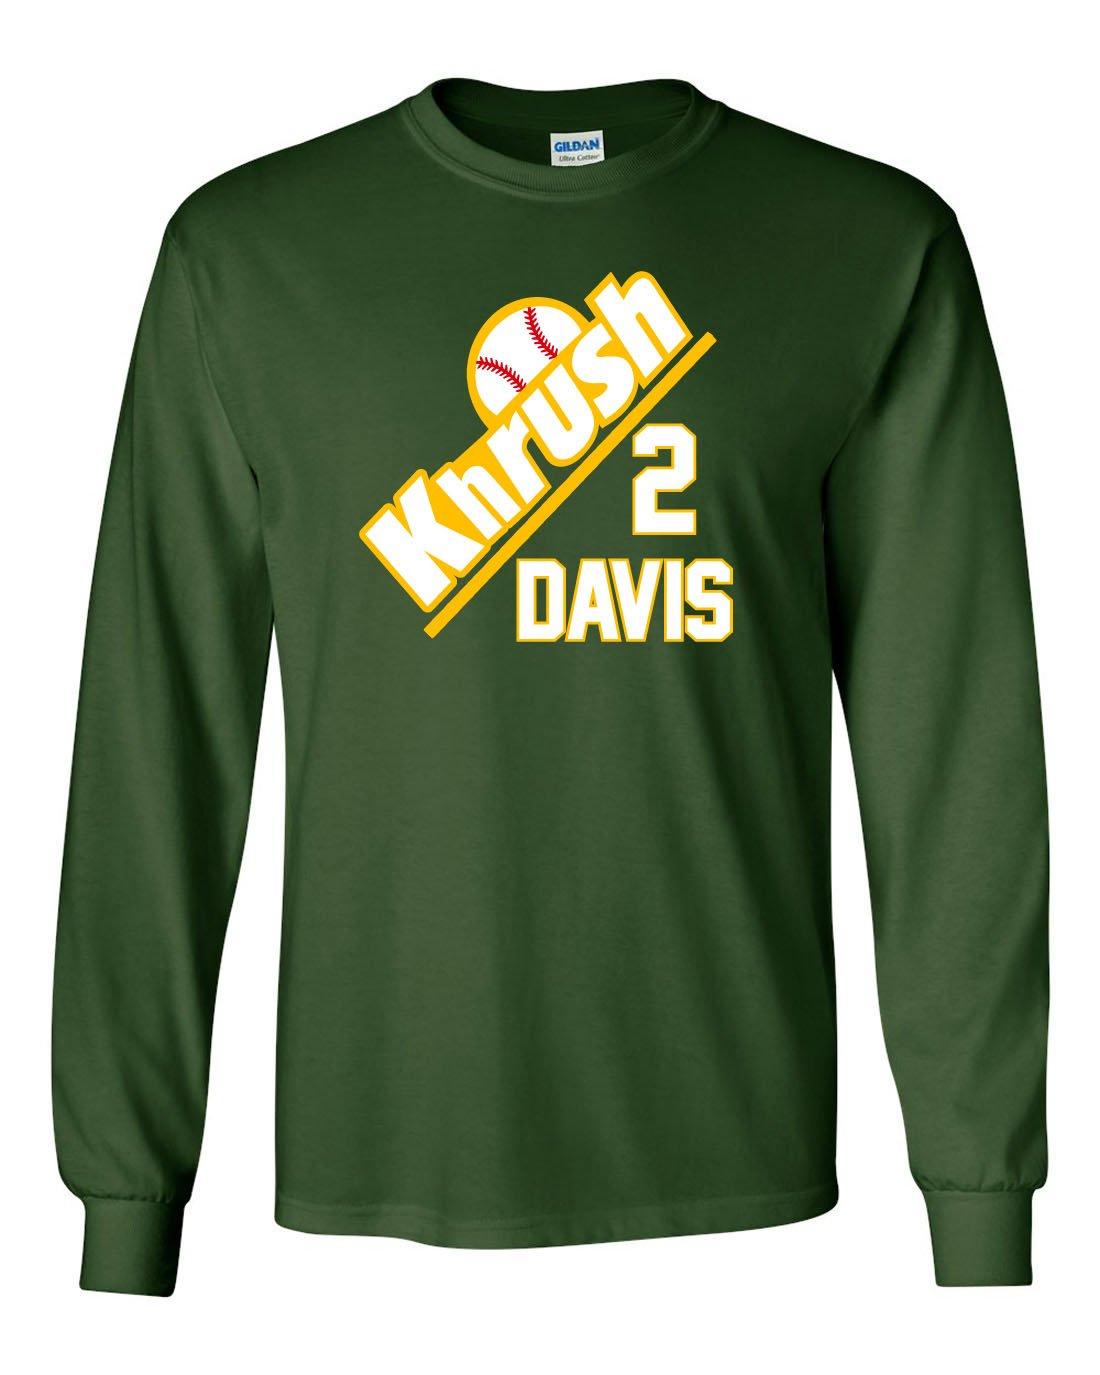 2 khris davis jersey amazon rh ohlson temp com